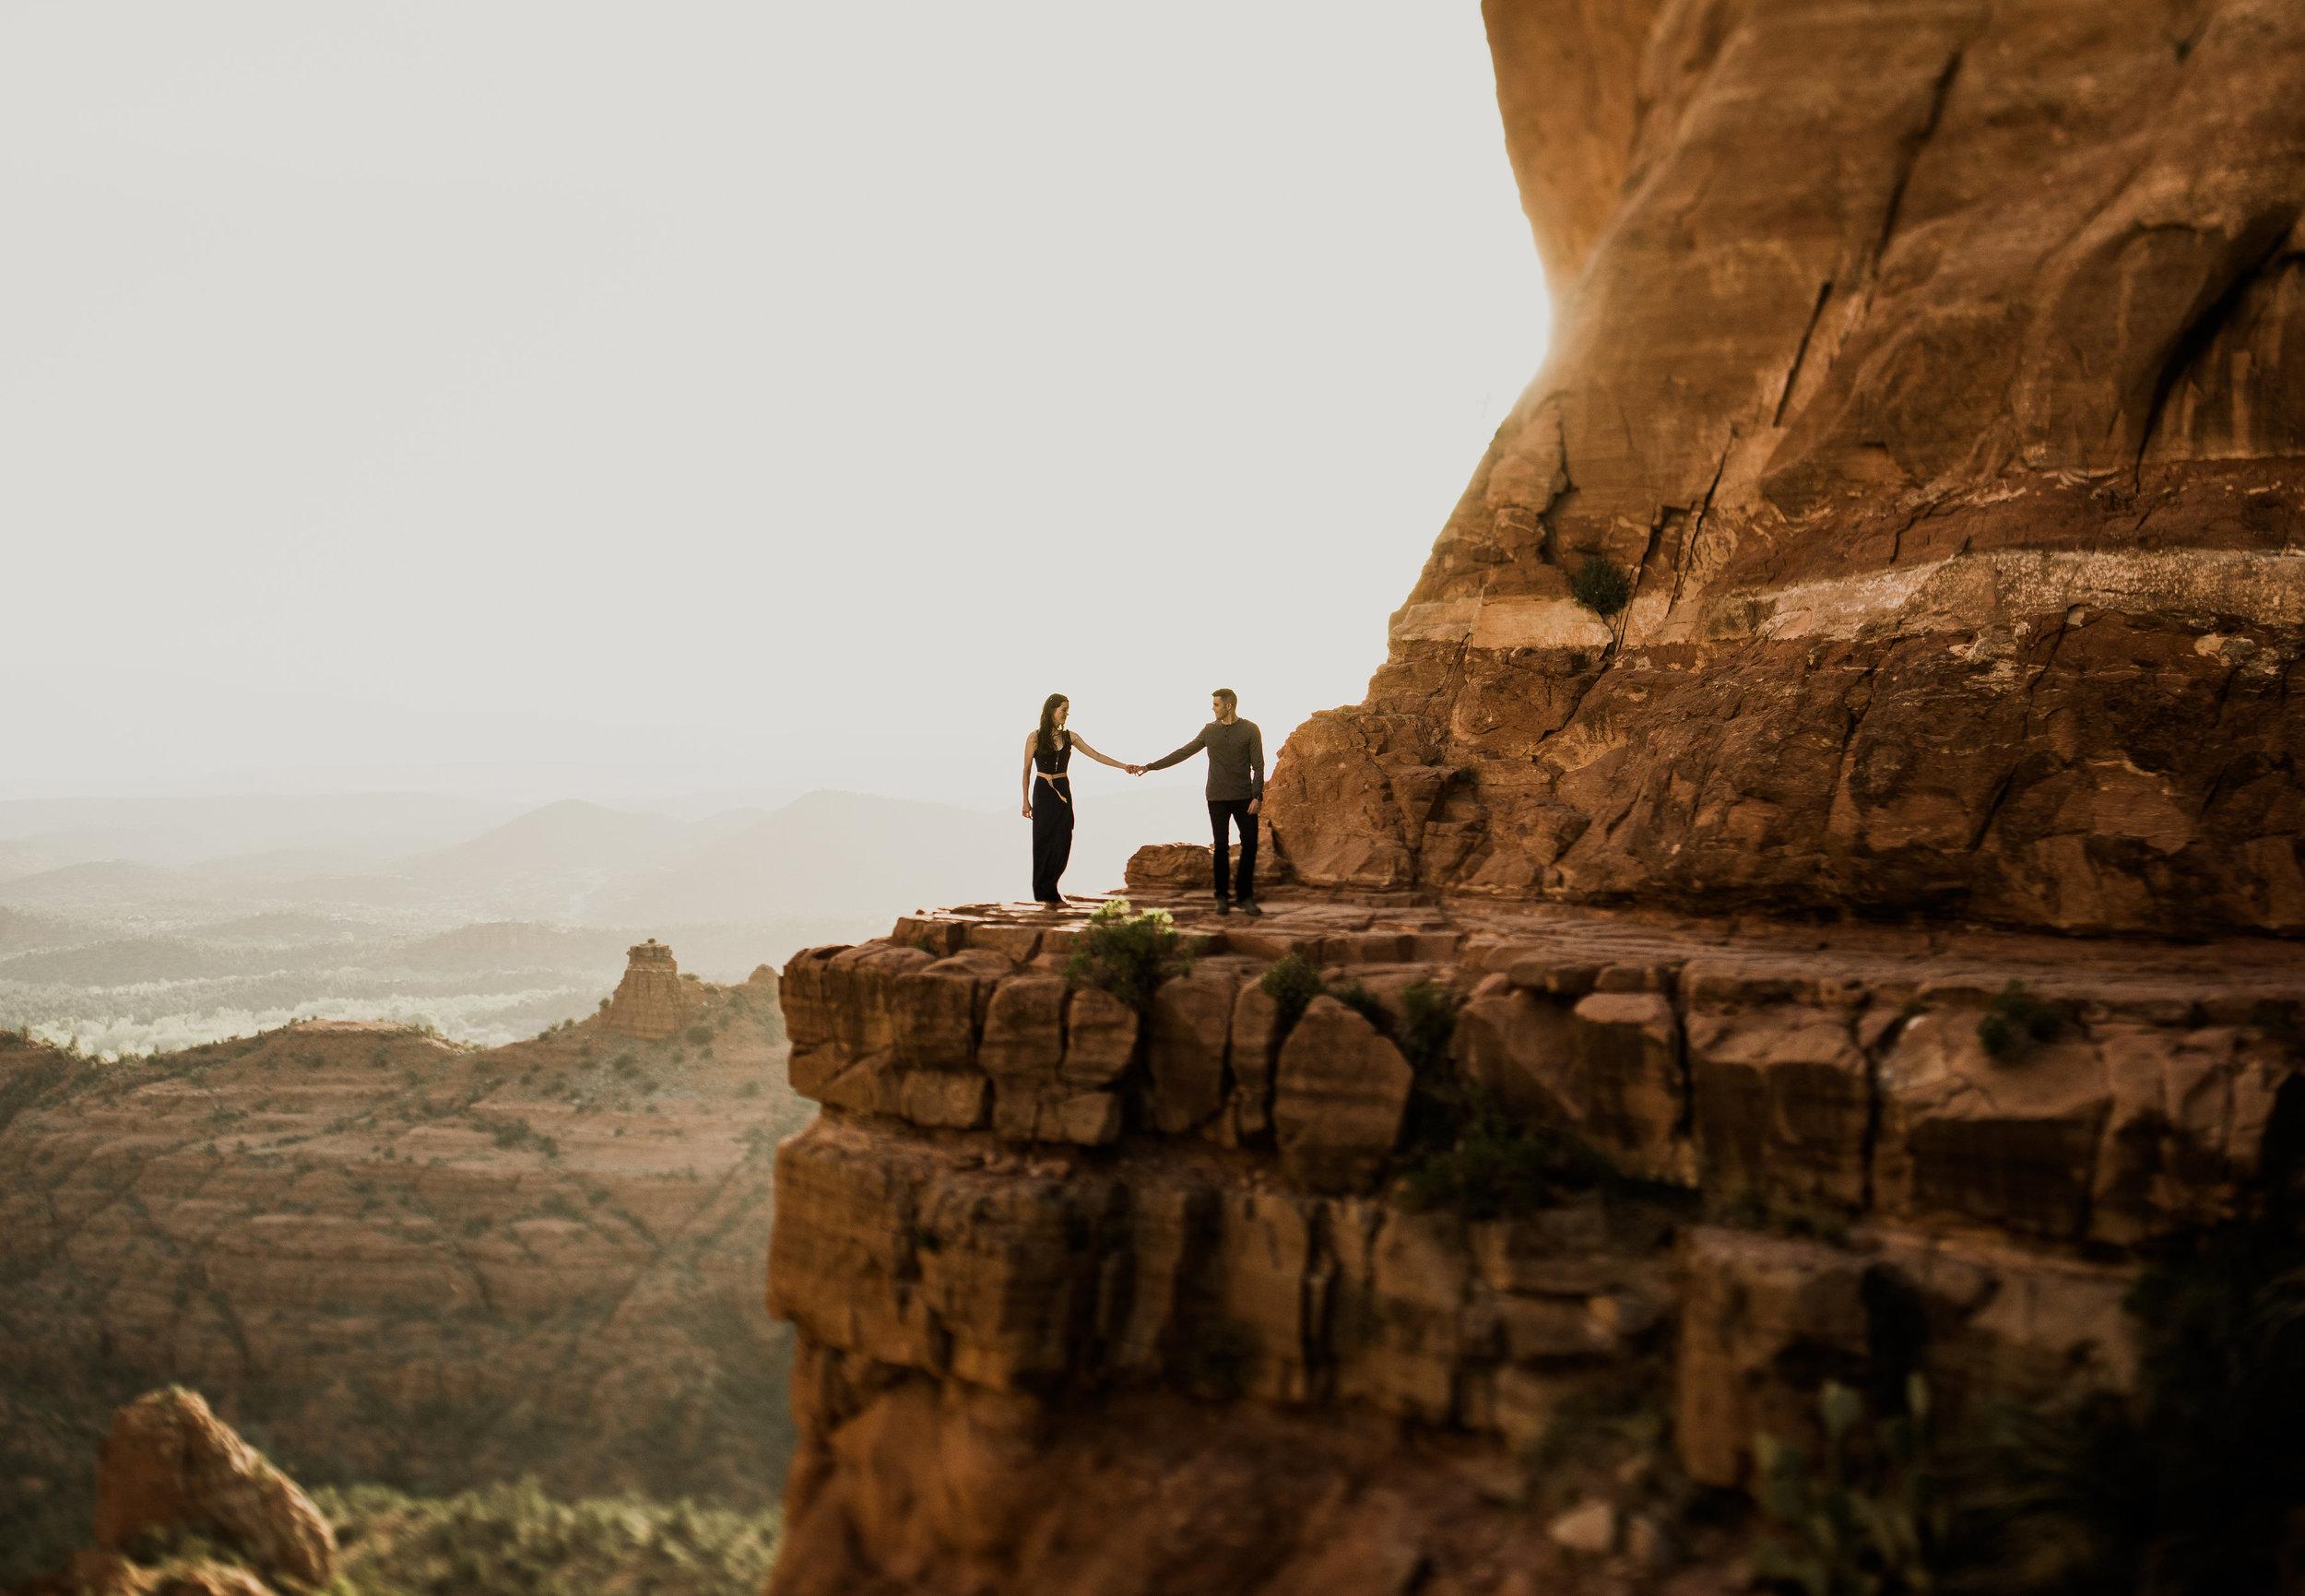 Isaiah-&-Taylor-Photography---Paul-&-Karen-Engagement,-Sedona-Arizona-114.jpg